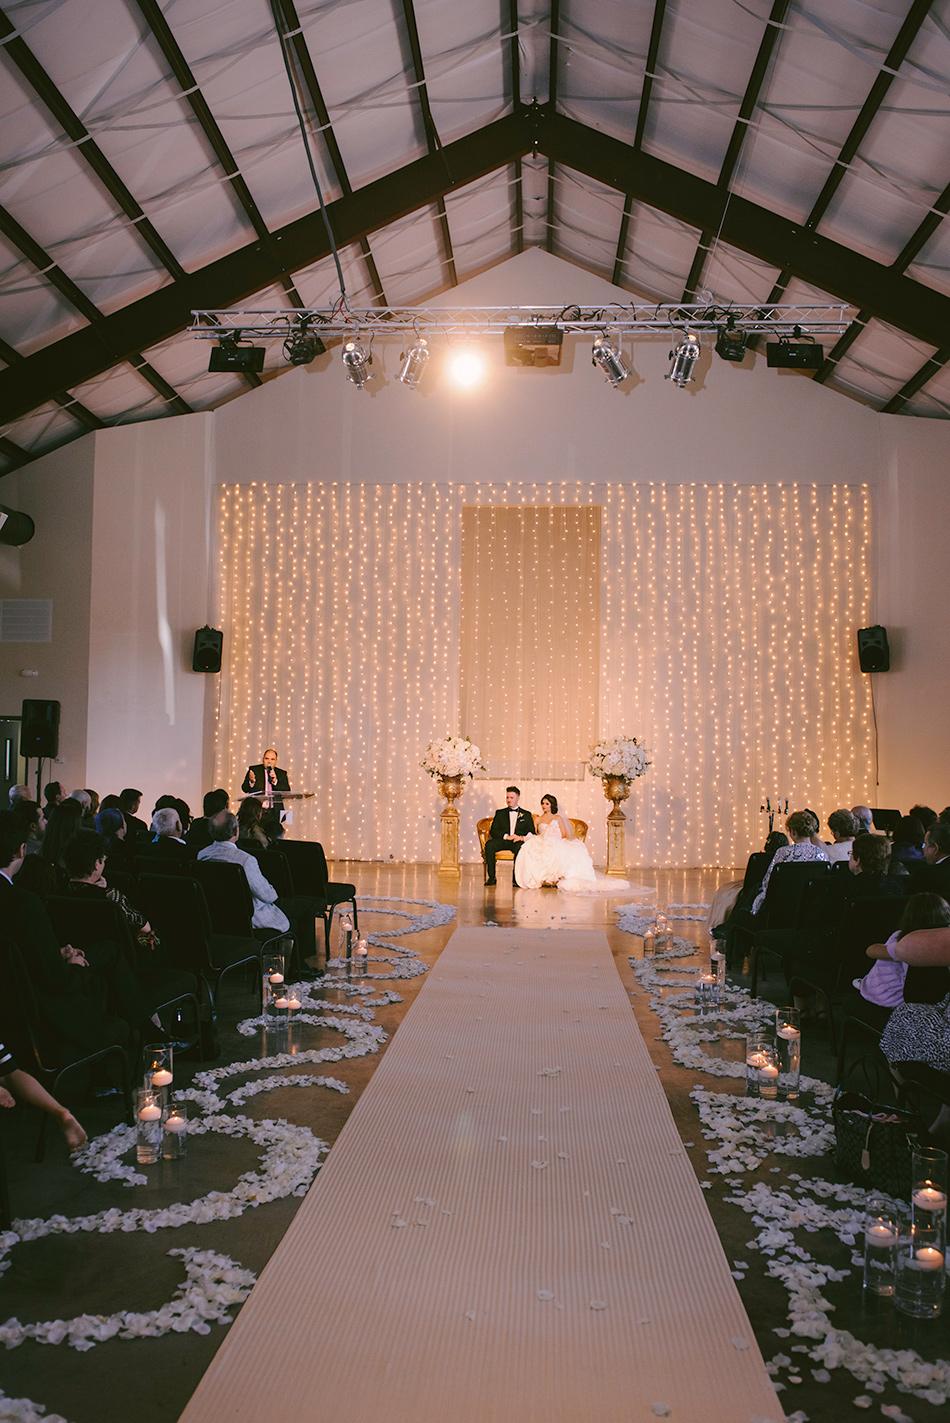 AD Passion Photography | stephany-and-nathan-wedding-dallas_146 | Adelin, Dida, fotograf profesionist, fotograf de nunta, fotografie de nunta, fotograf Timisoara, fotograf Craiova, fotograf Bucuresti, fotograf Arad, nunta Timisoara, nunta Arad, nunta Bucuresti, nunta Craiova